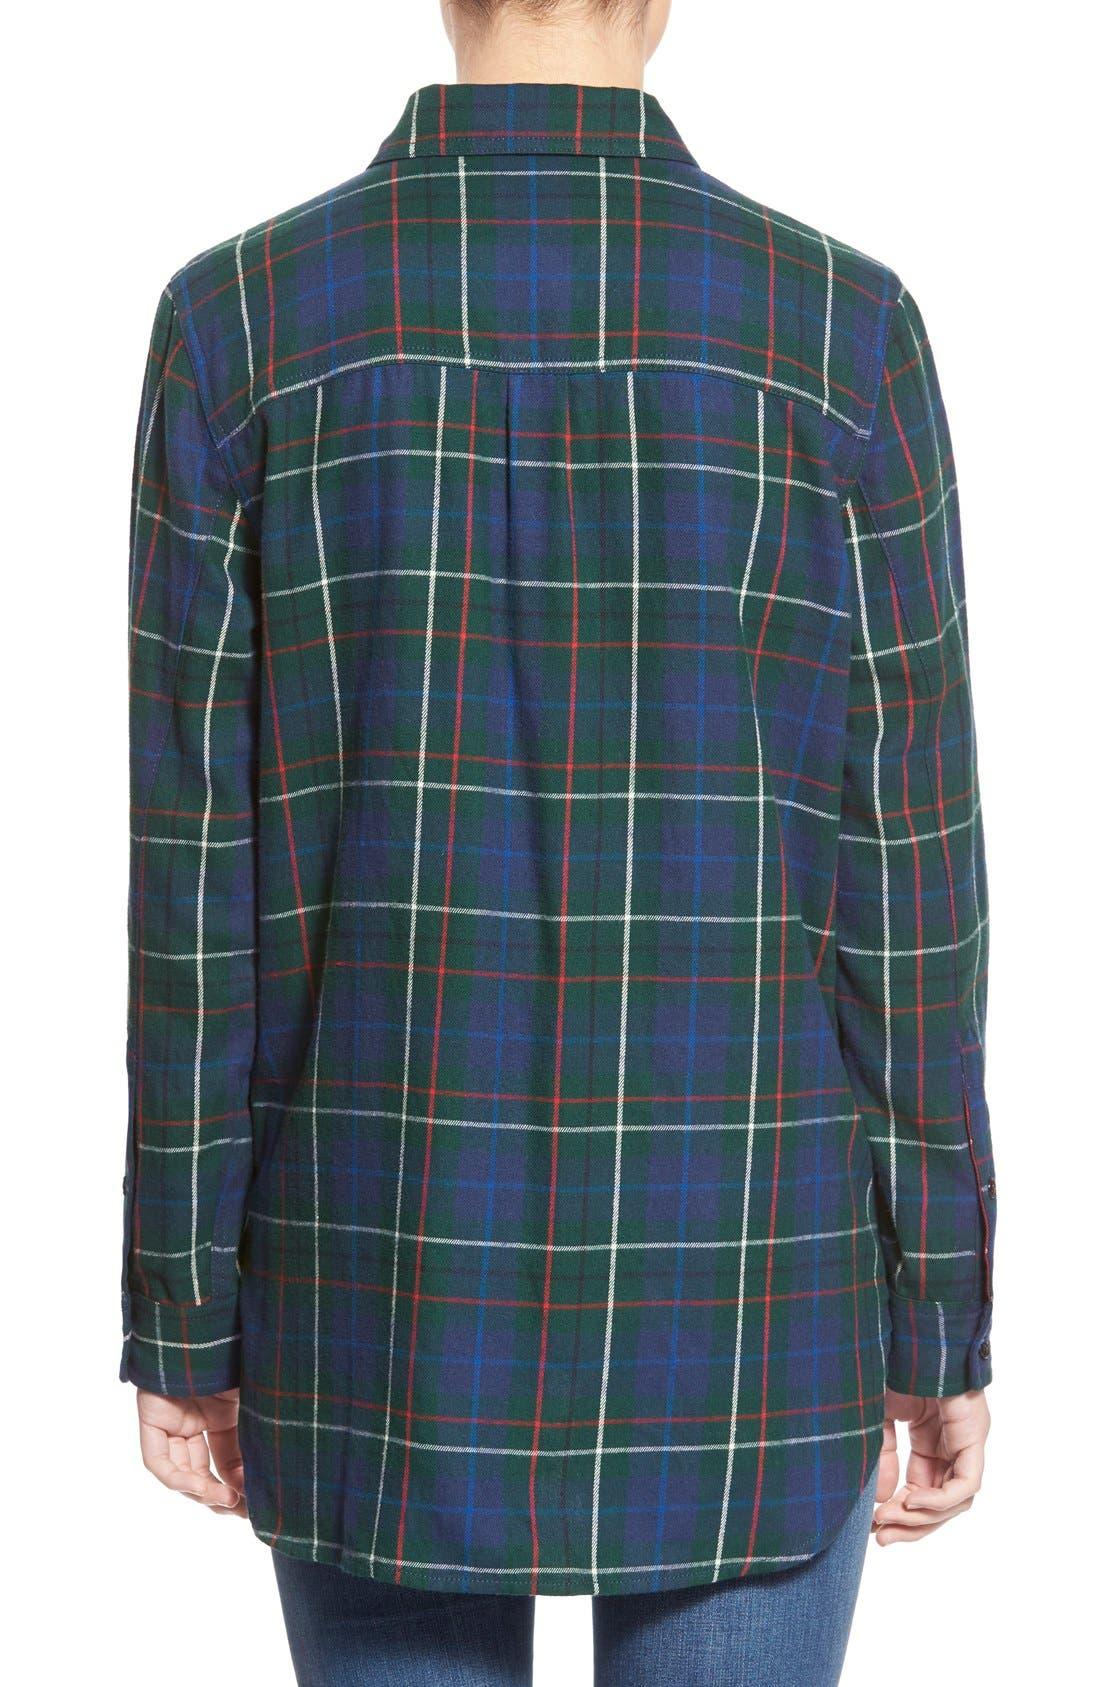 Ex Boyfriend - Ontario Plaid Flannel Shirt,                             Alternate thumbnail 2, color,